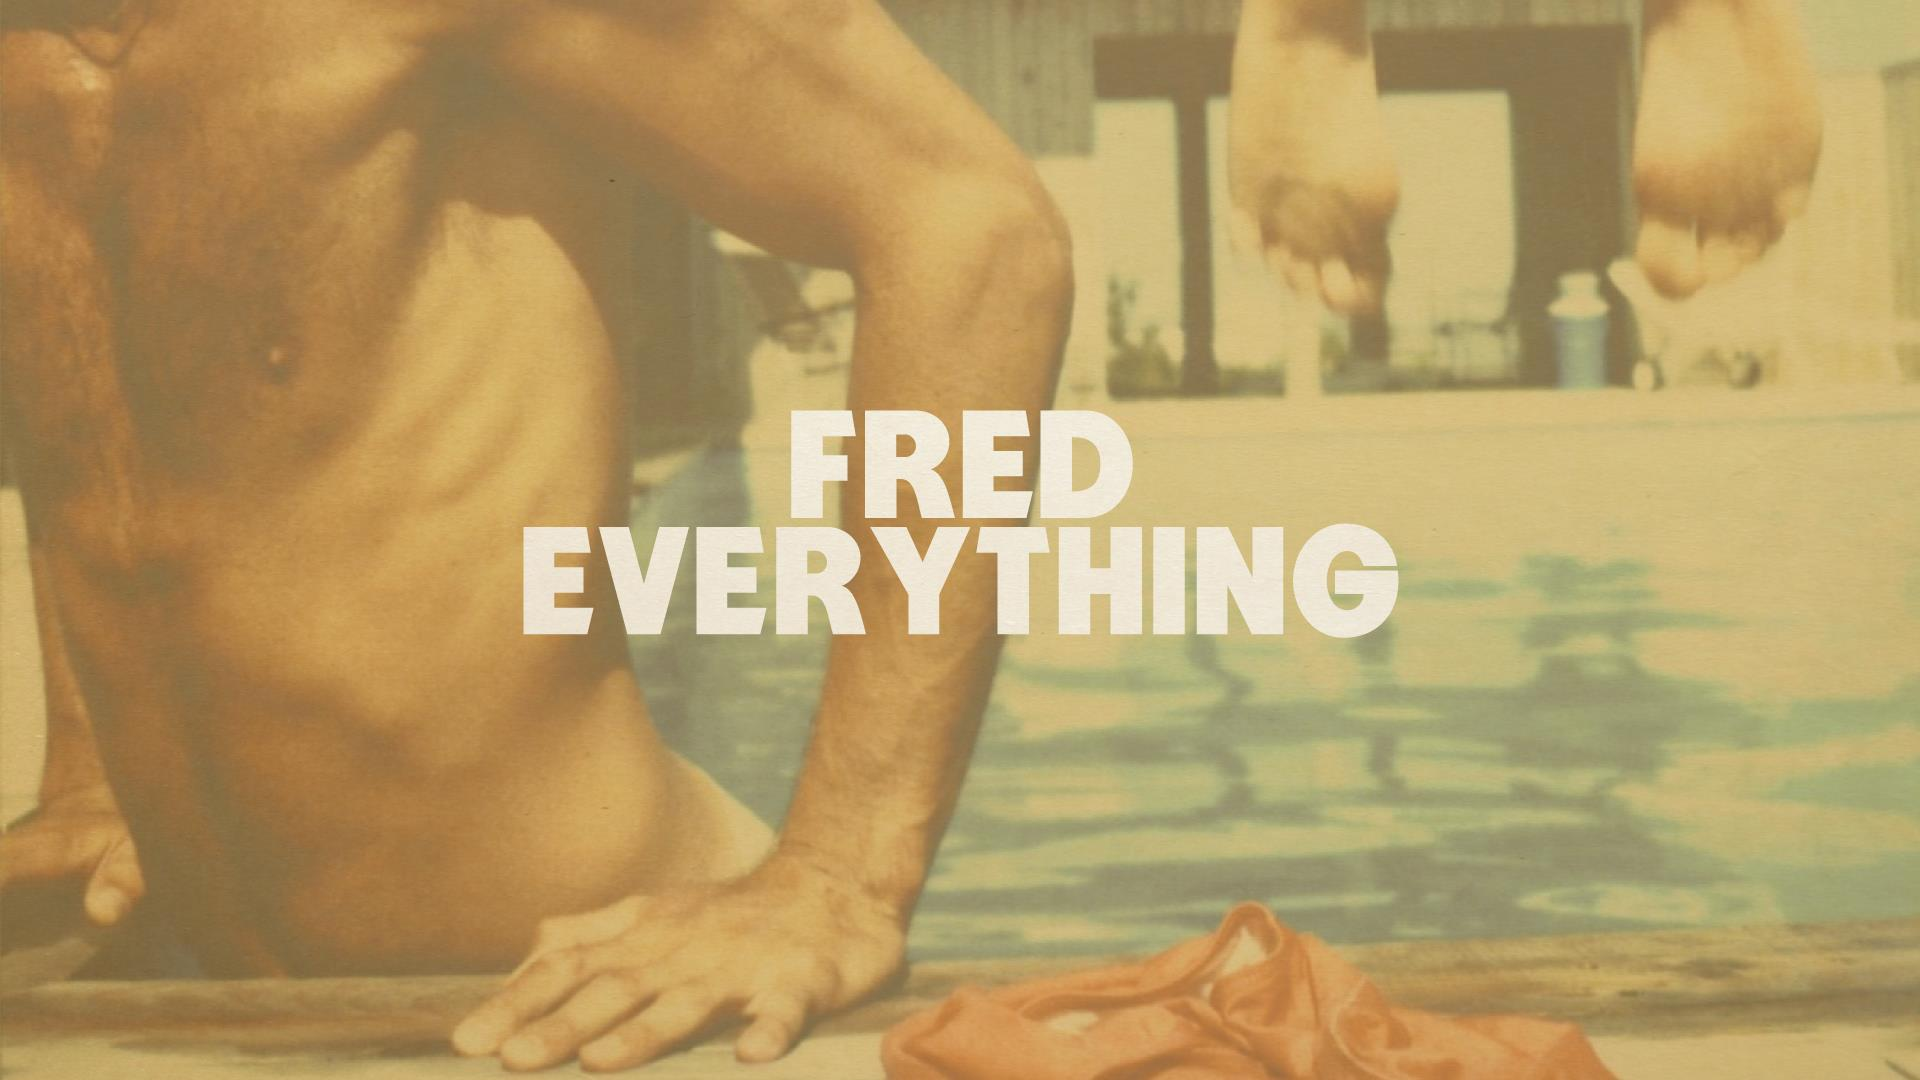 fred-everything.jpg